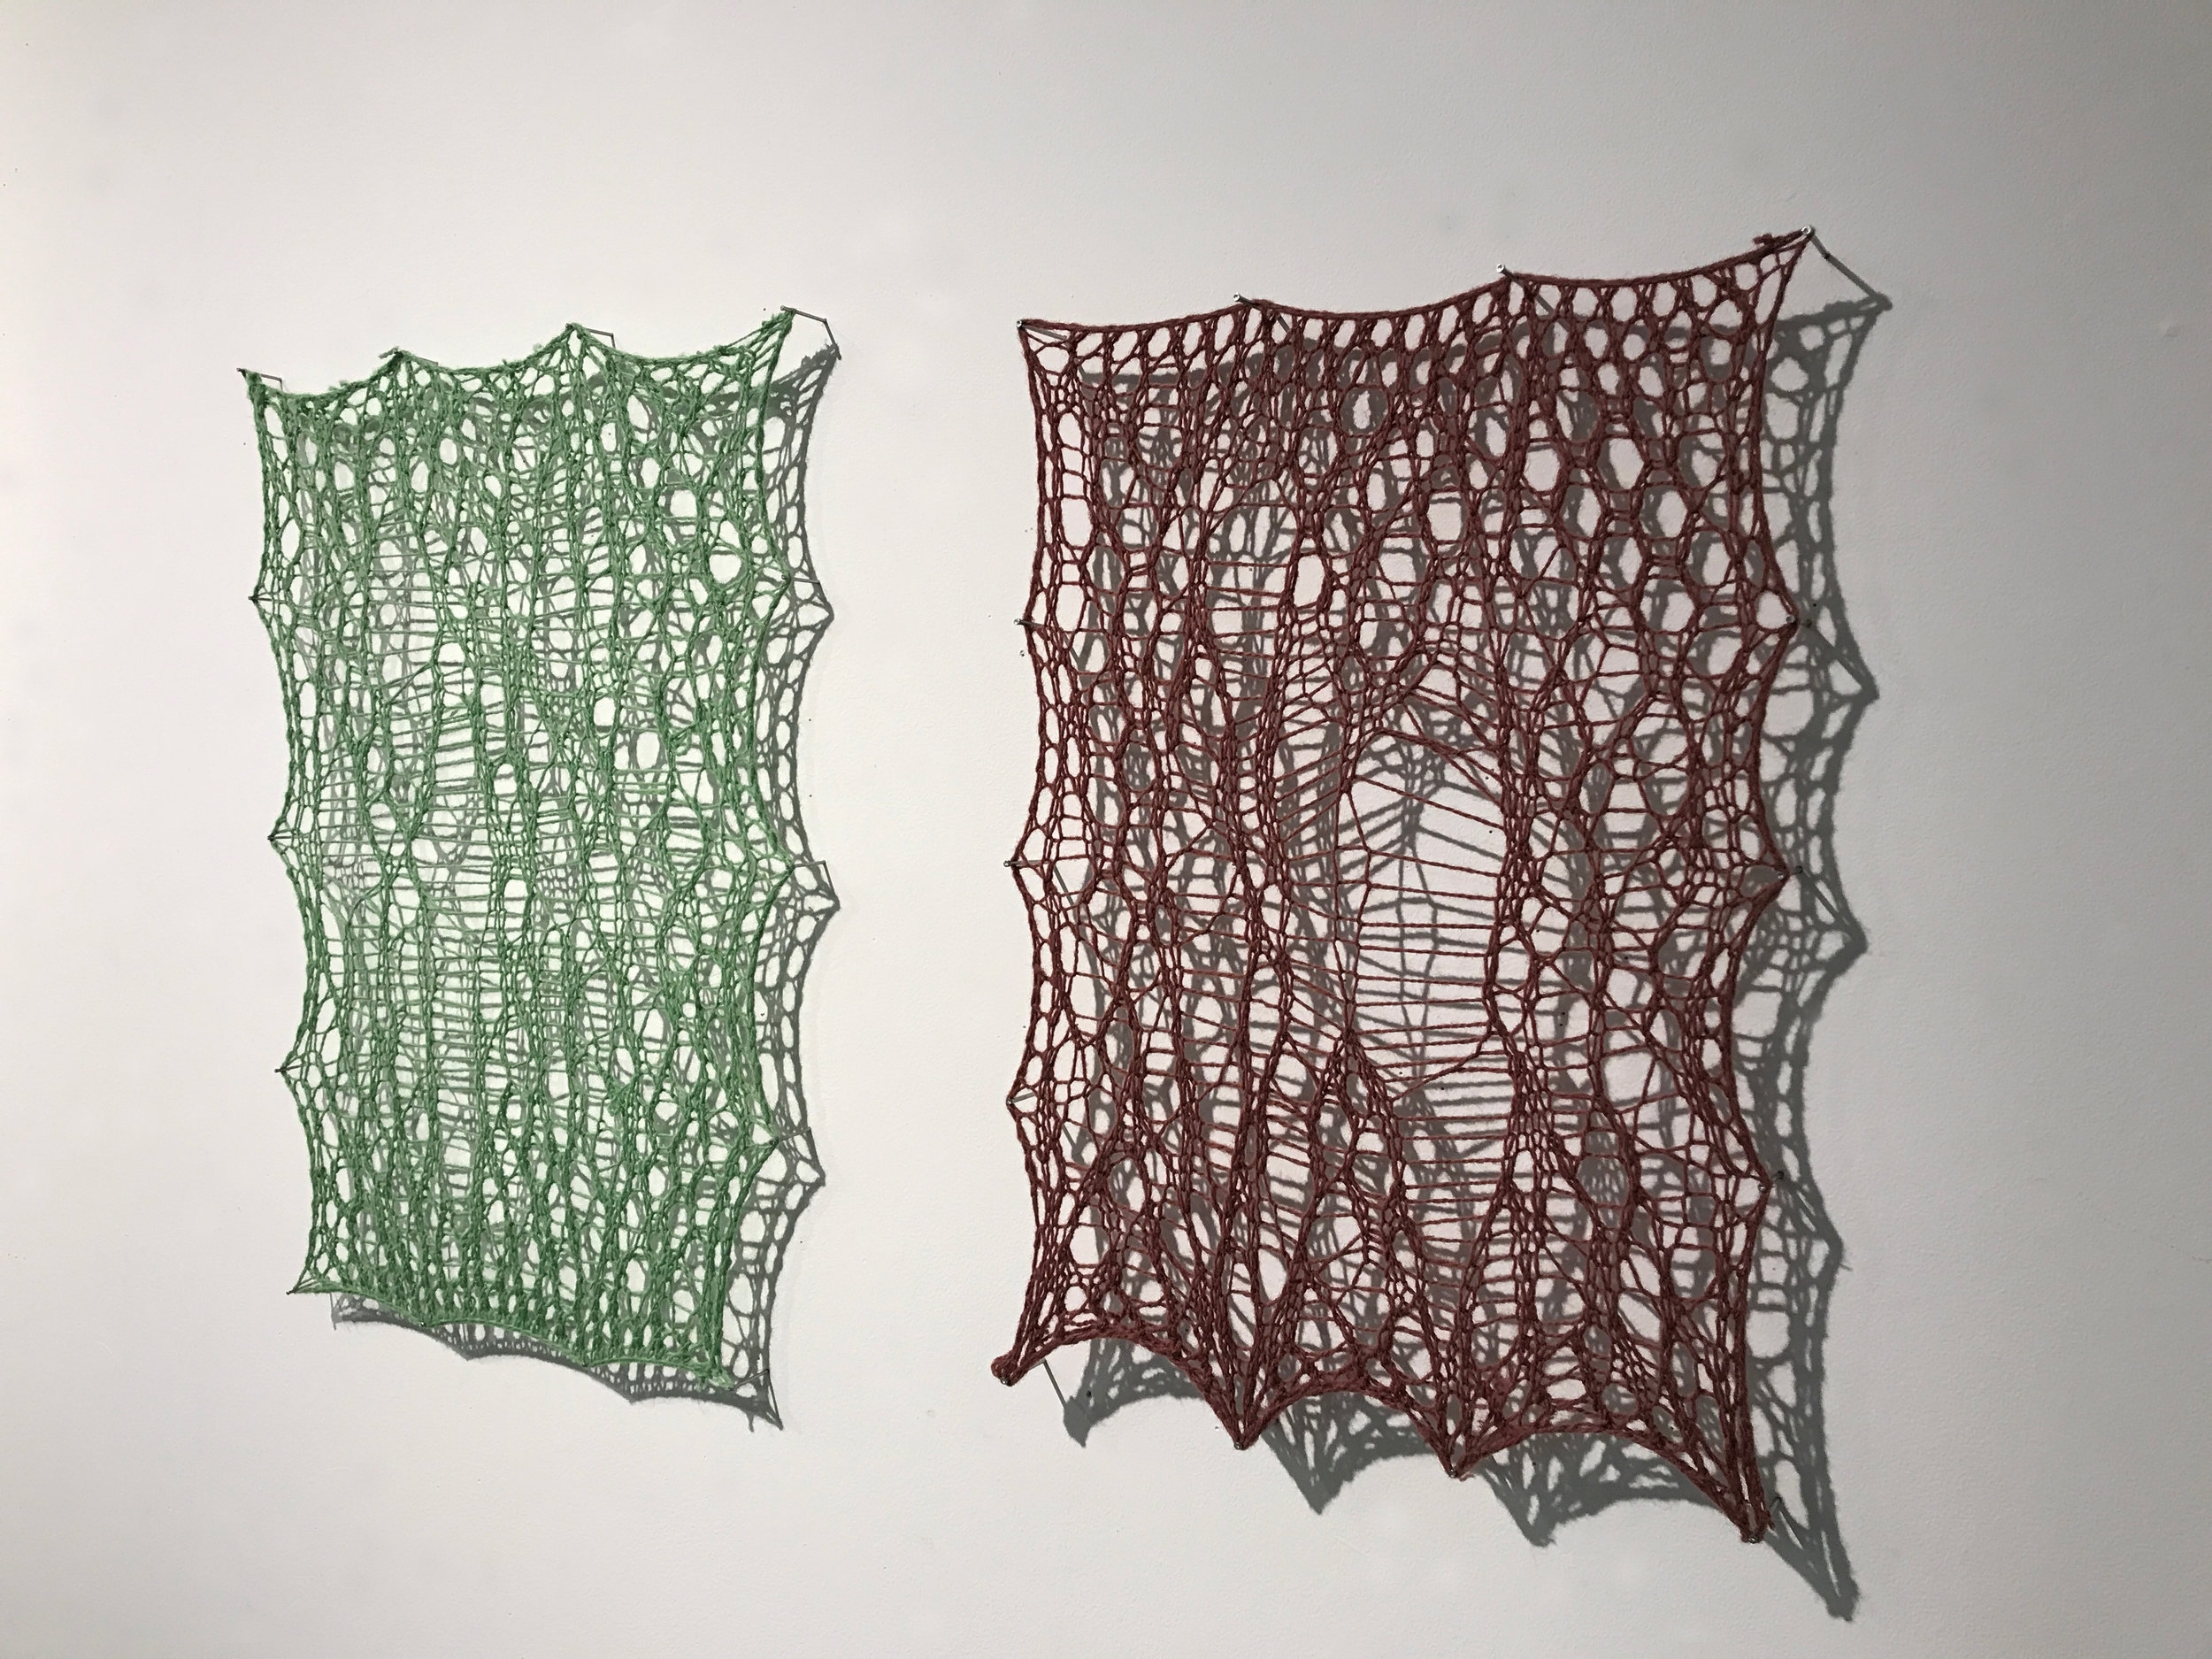 Asymmetric Laces (2018)